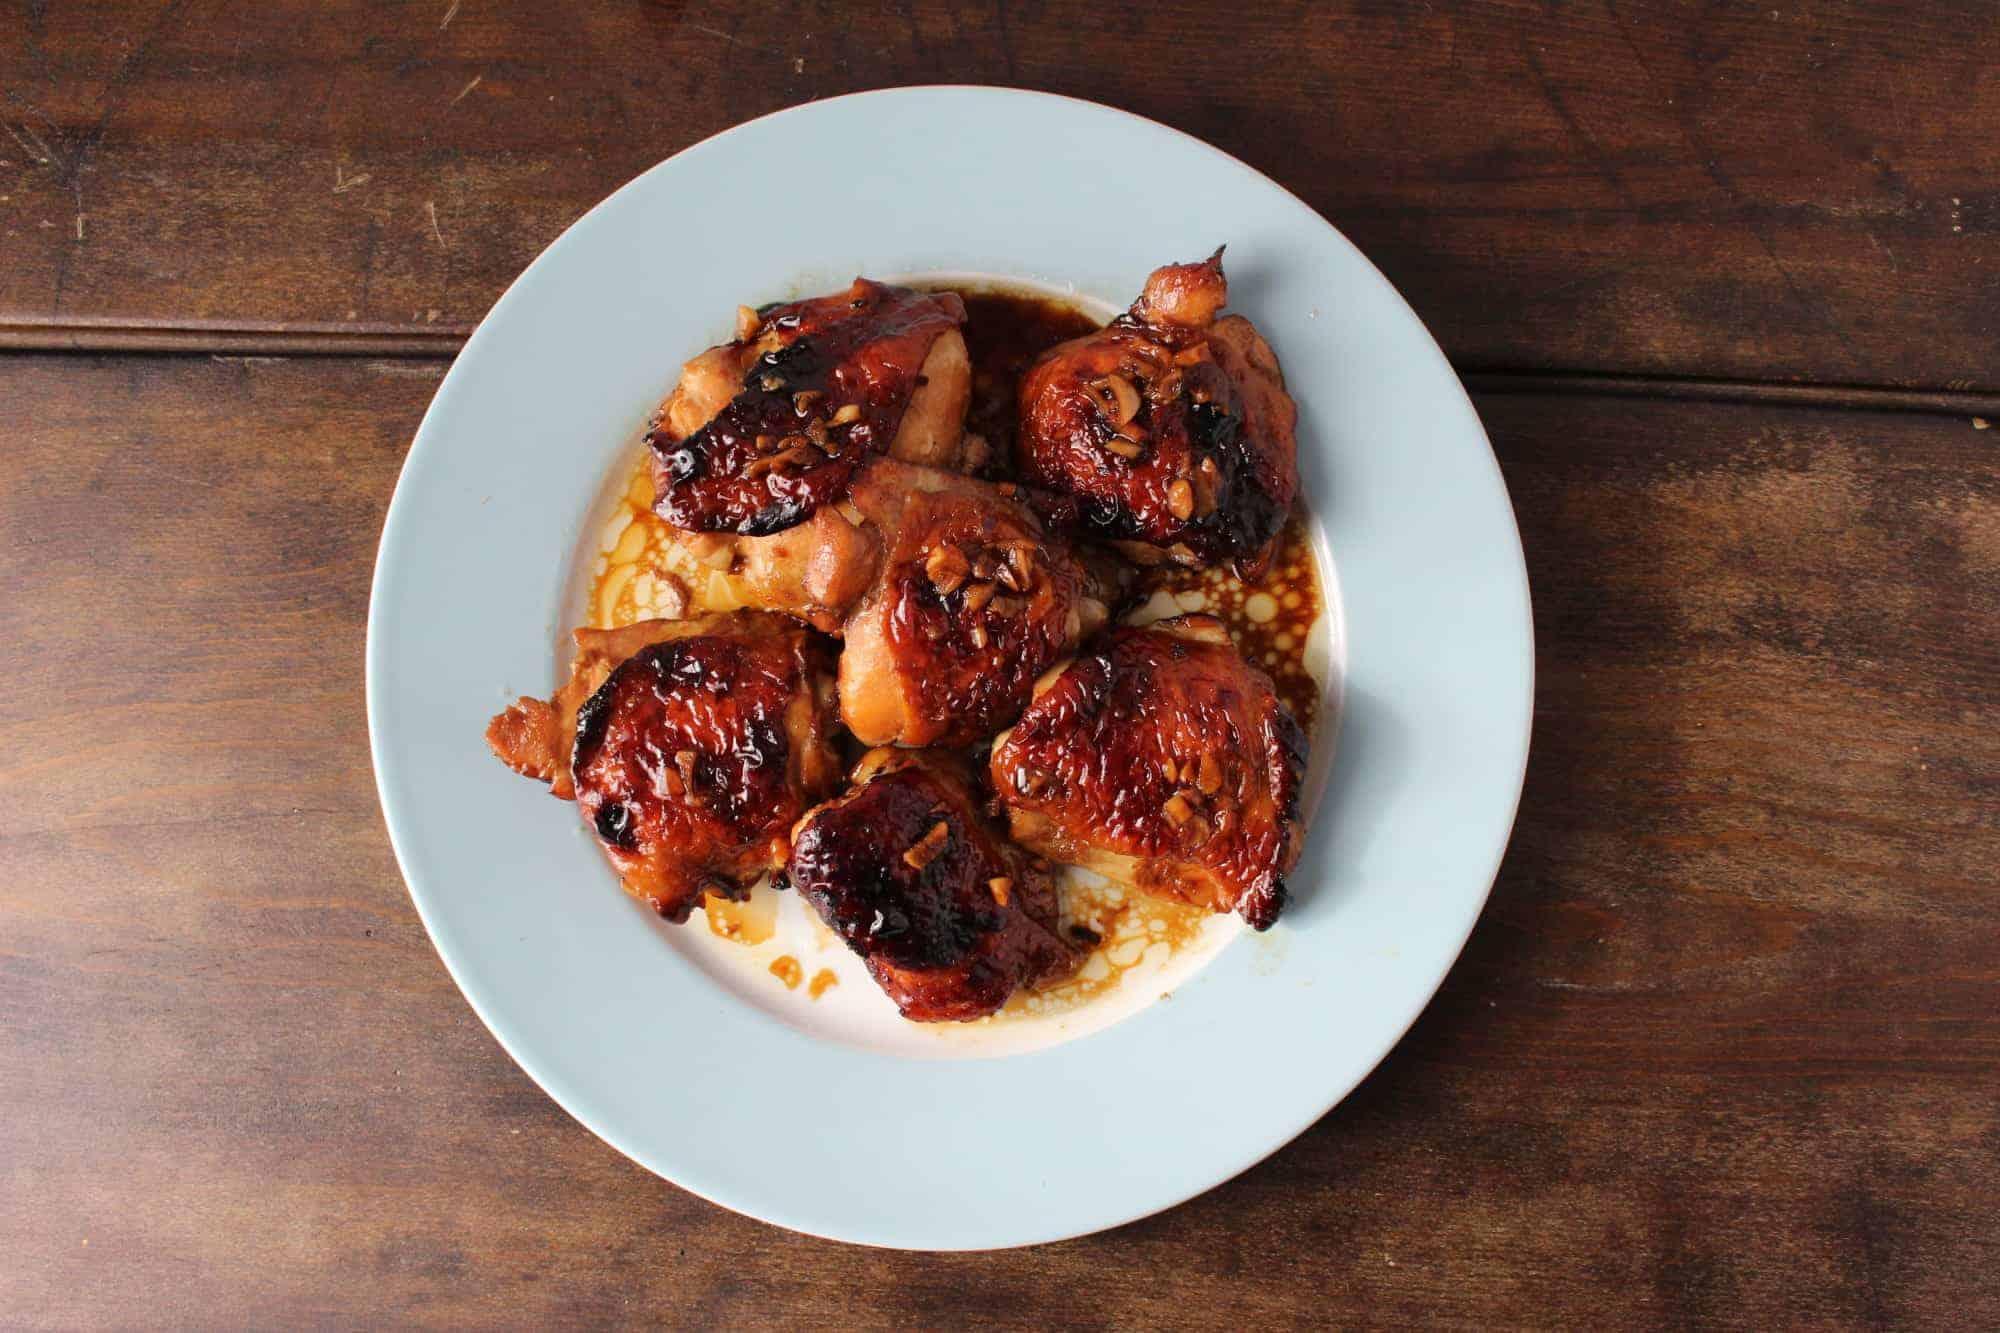 ChickenandGrilledRomaine